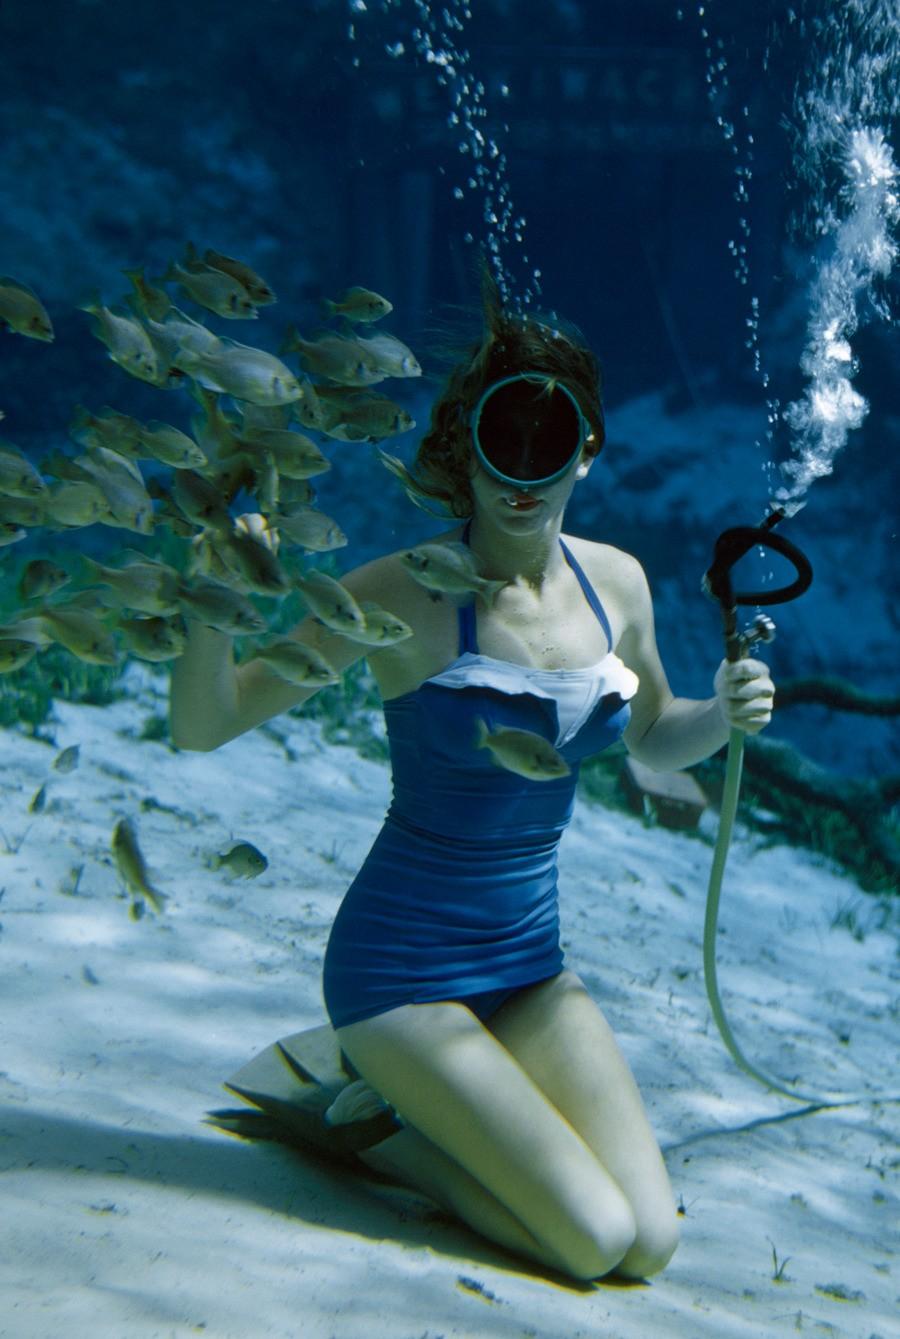 Подводное плавание в Вики-Вачи-Спрингс, Флорида, 1955. Фотограф Бейтс Литтлхейлз